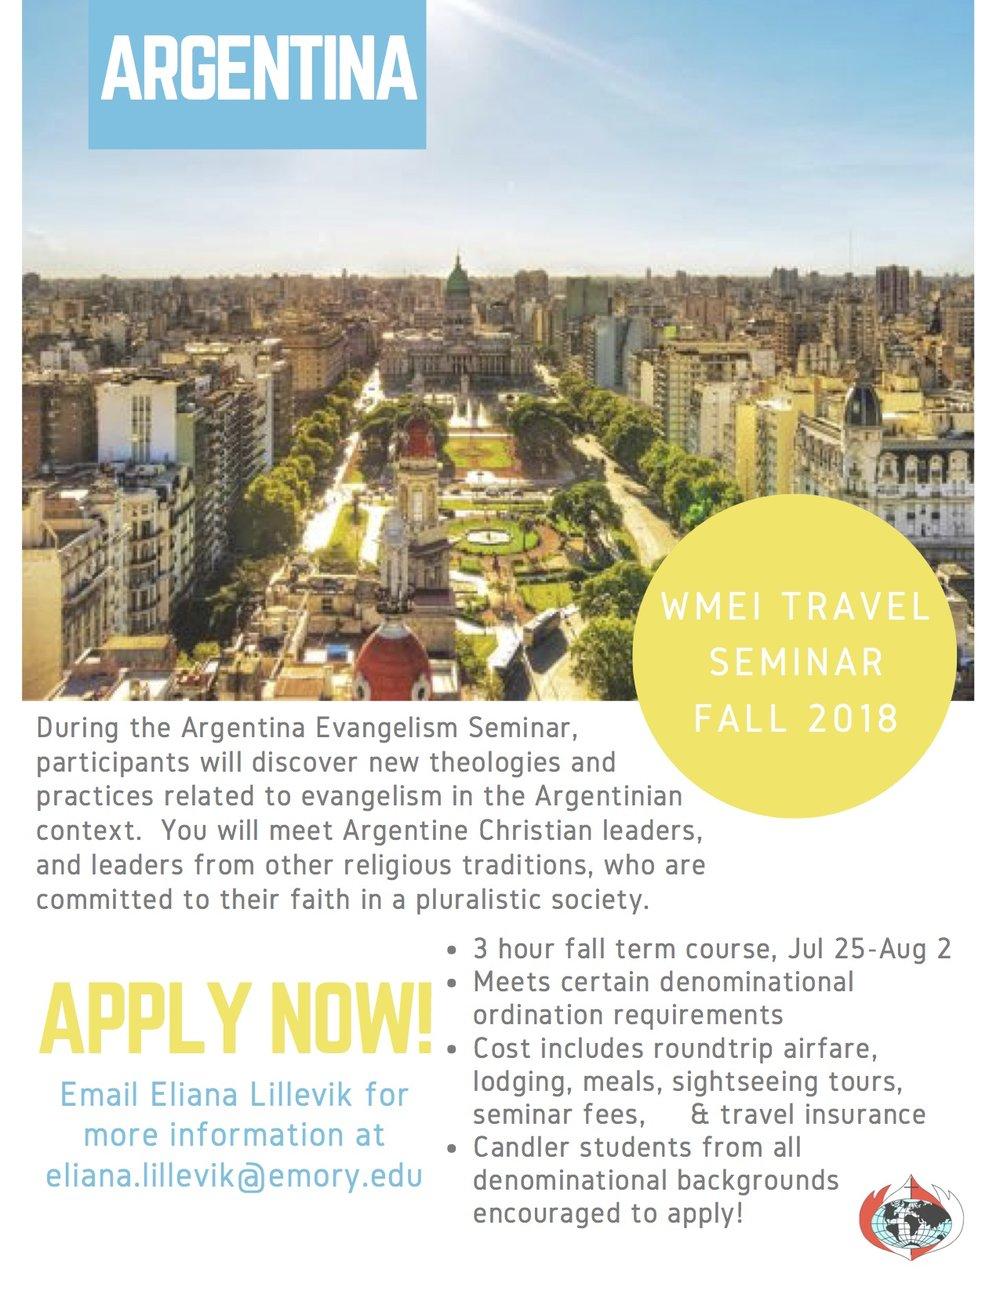 Argentina Travel Seminar WMEI Flyer Final.jpg